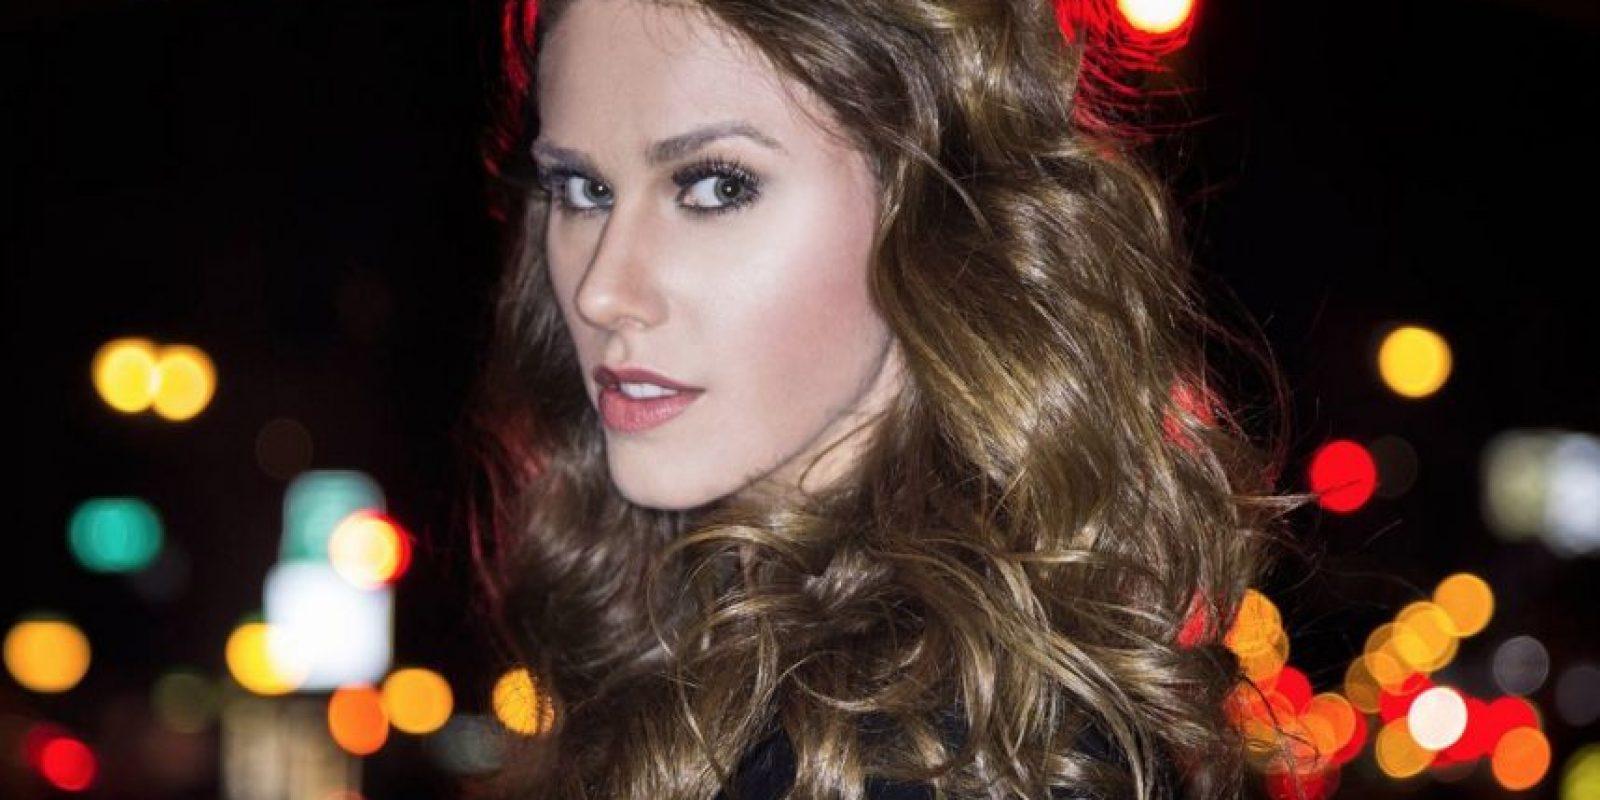 Foto:Vía facebook.com/pages/Diamondsandheels14-Cassandra-Bankson